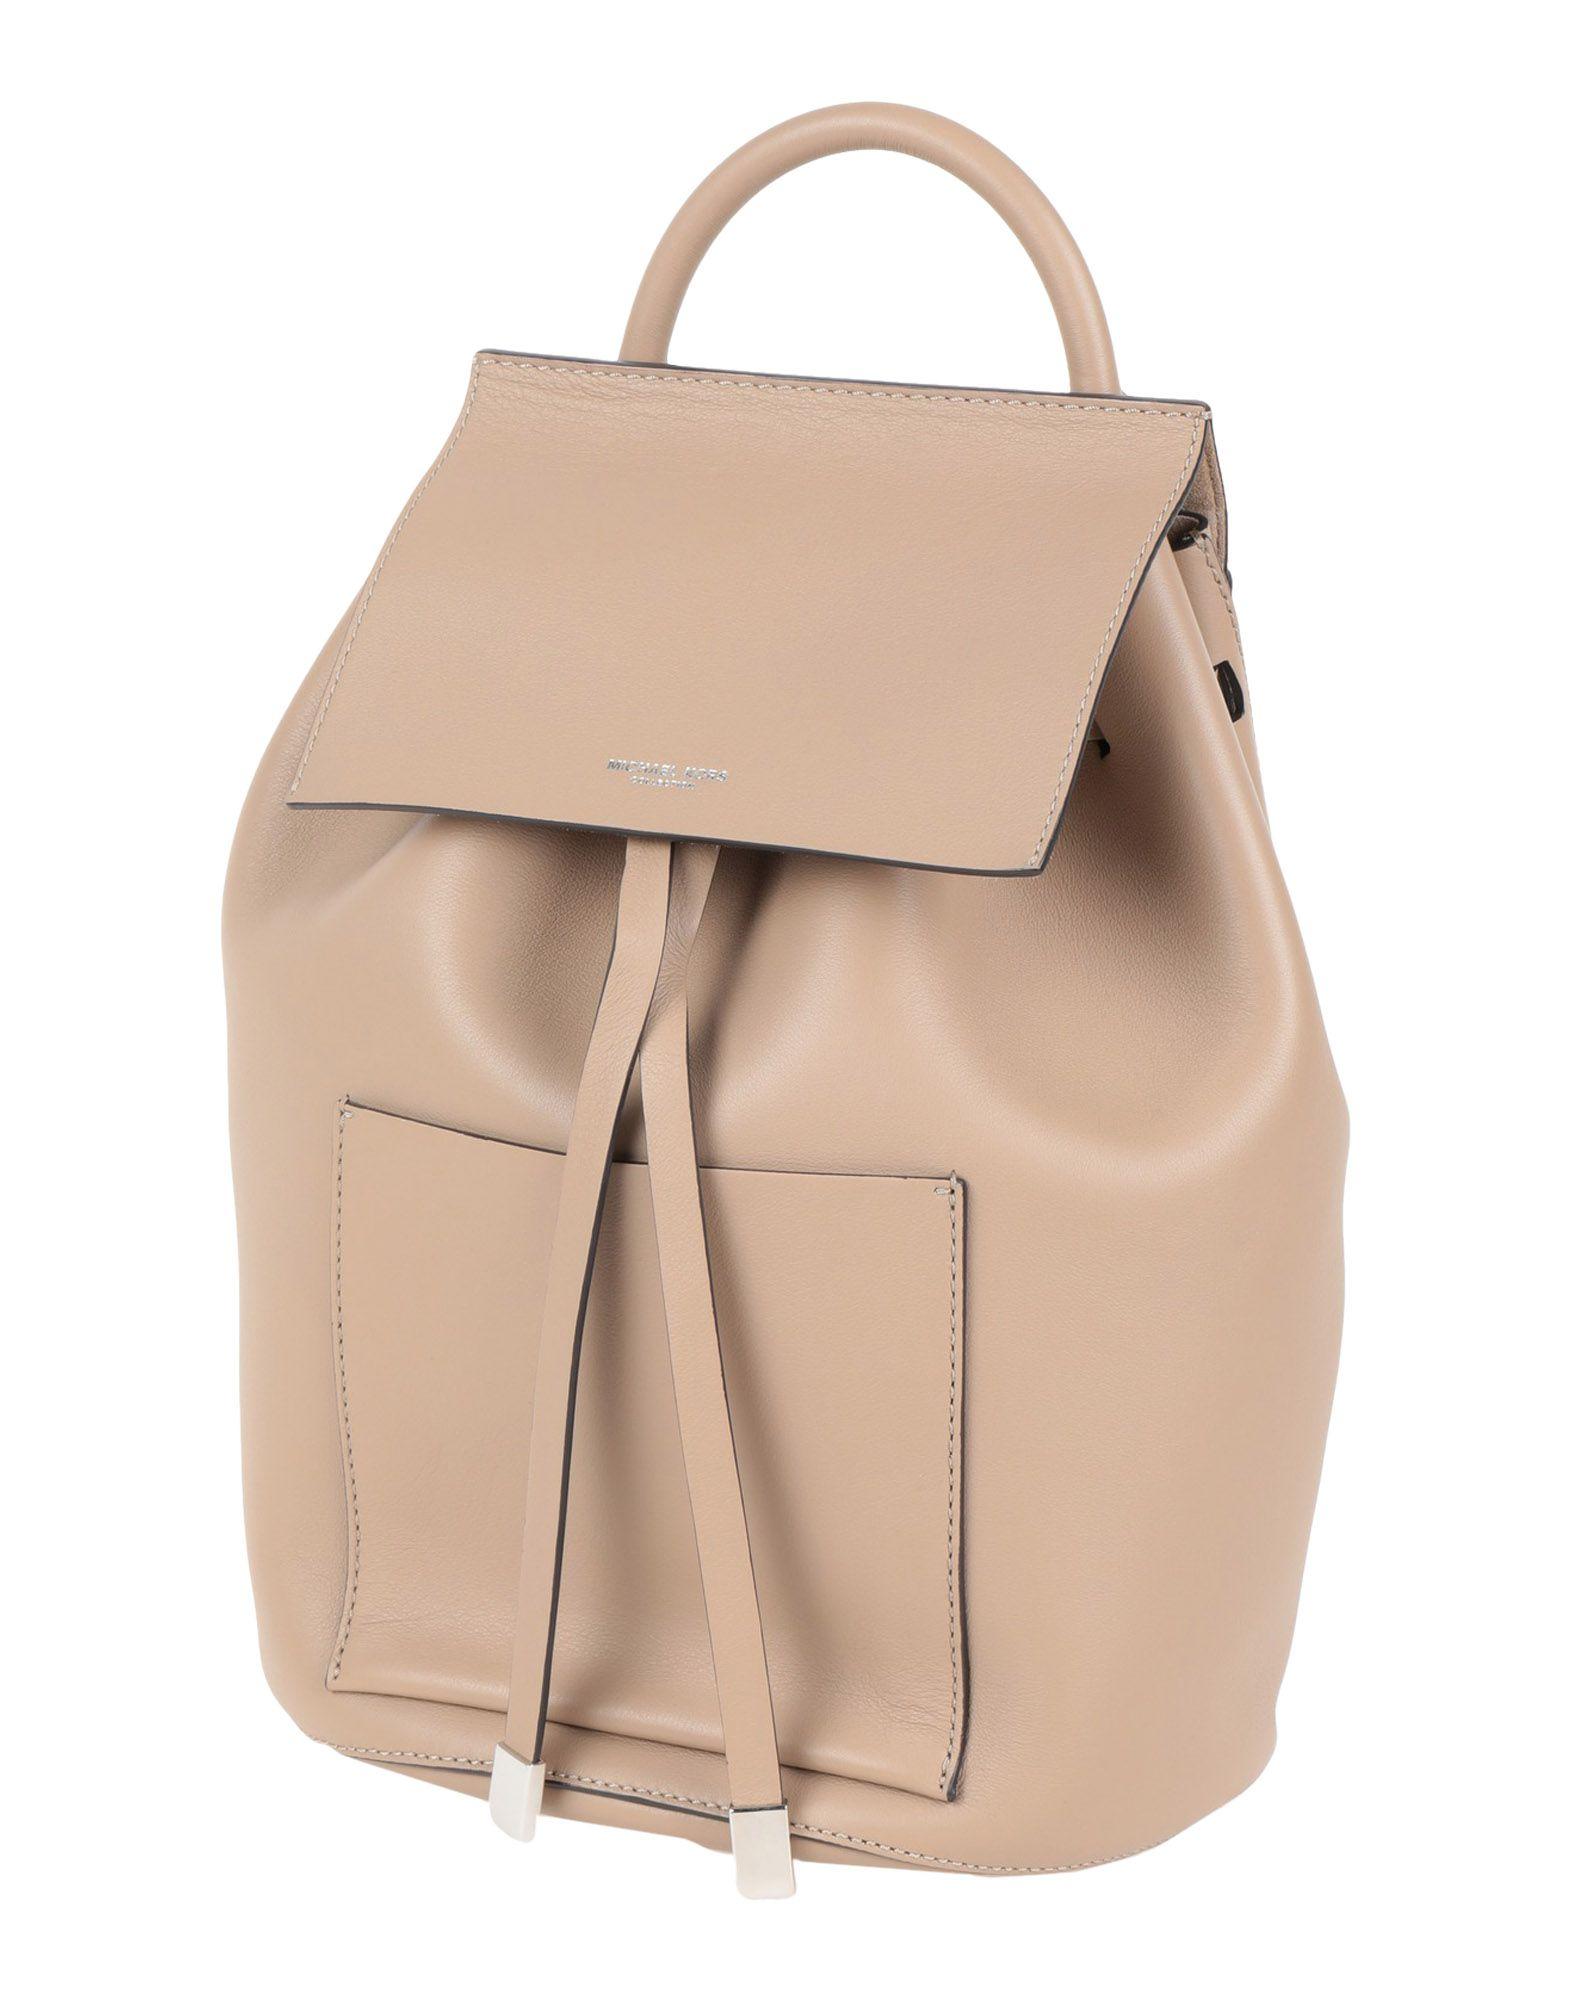 MICHAEL KORS COLLECTION Рюкзаки и сумки на пояс michael michael kors рюкзаки и сумки на пояс